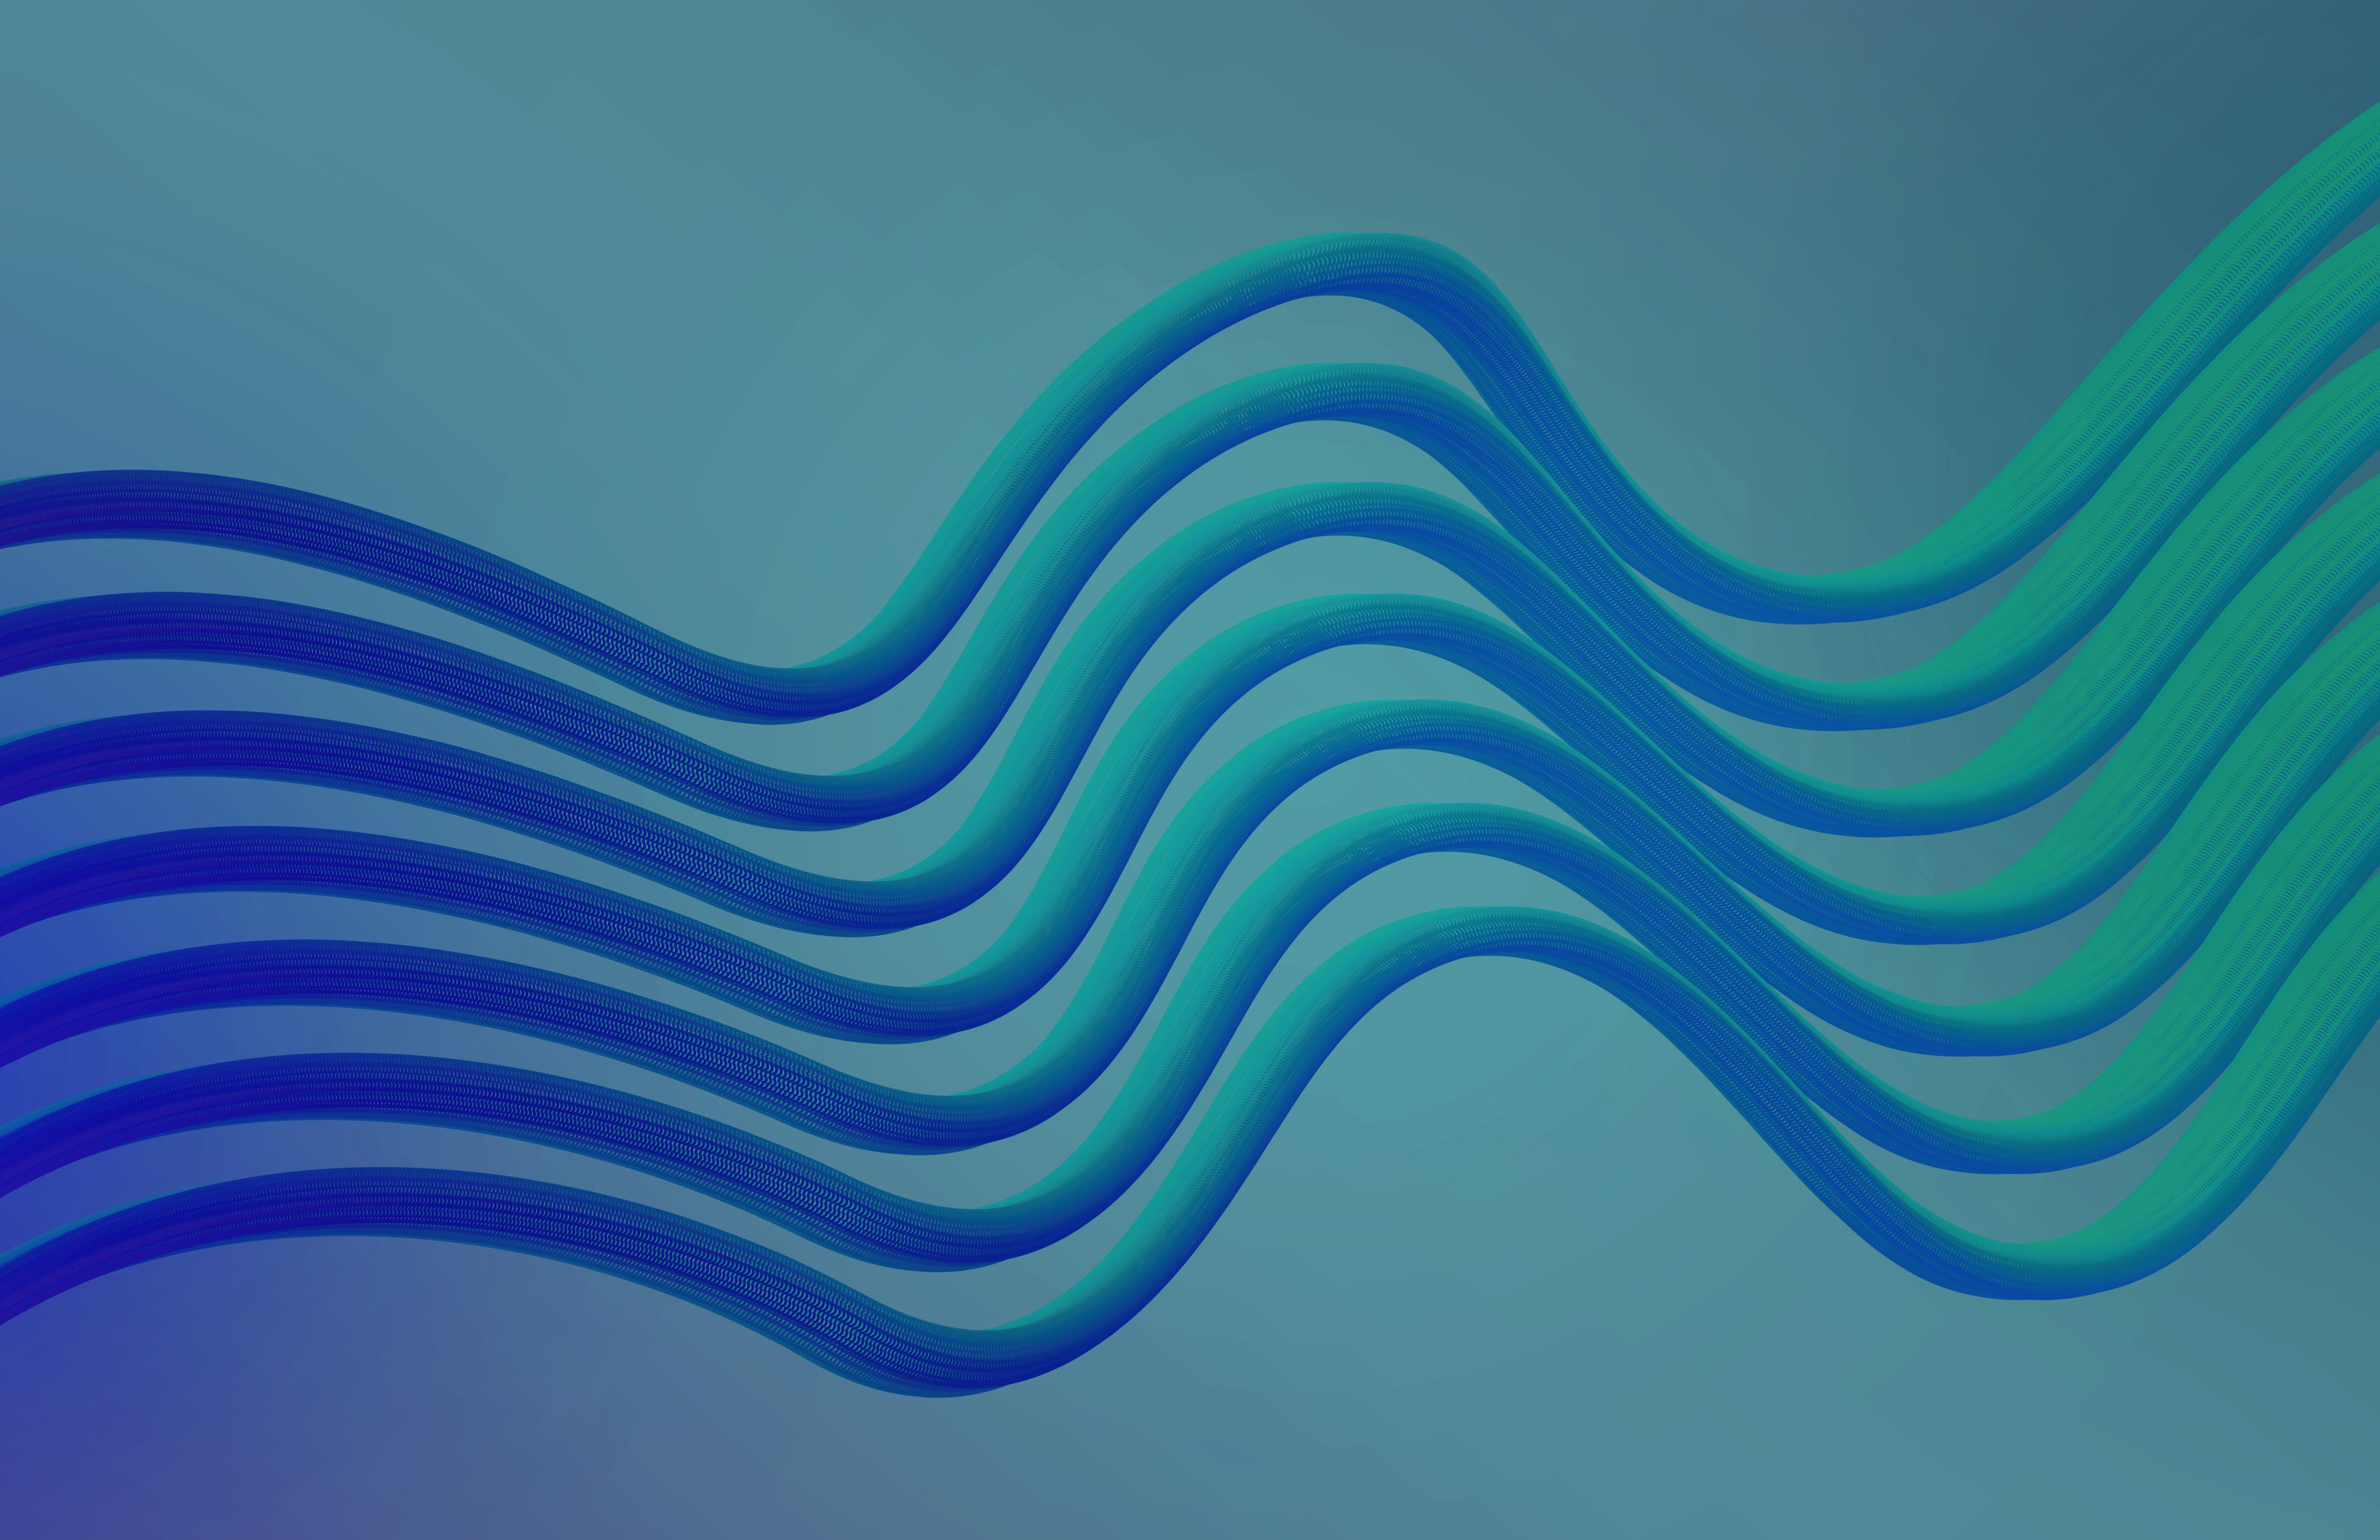 Colorful fluid wallpaper 01 - Fluid wallpaper ...